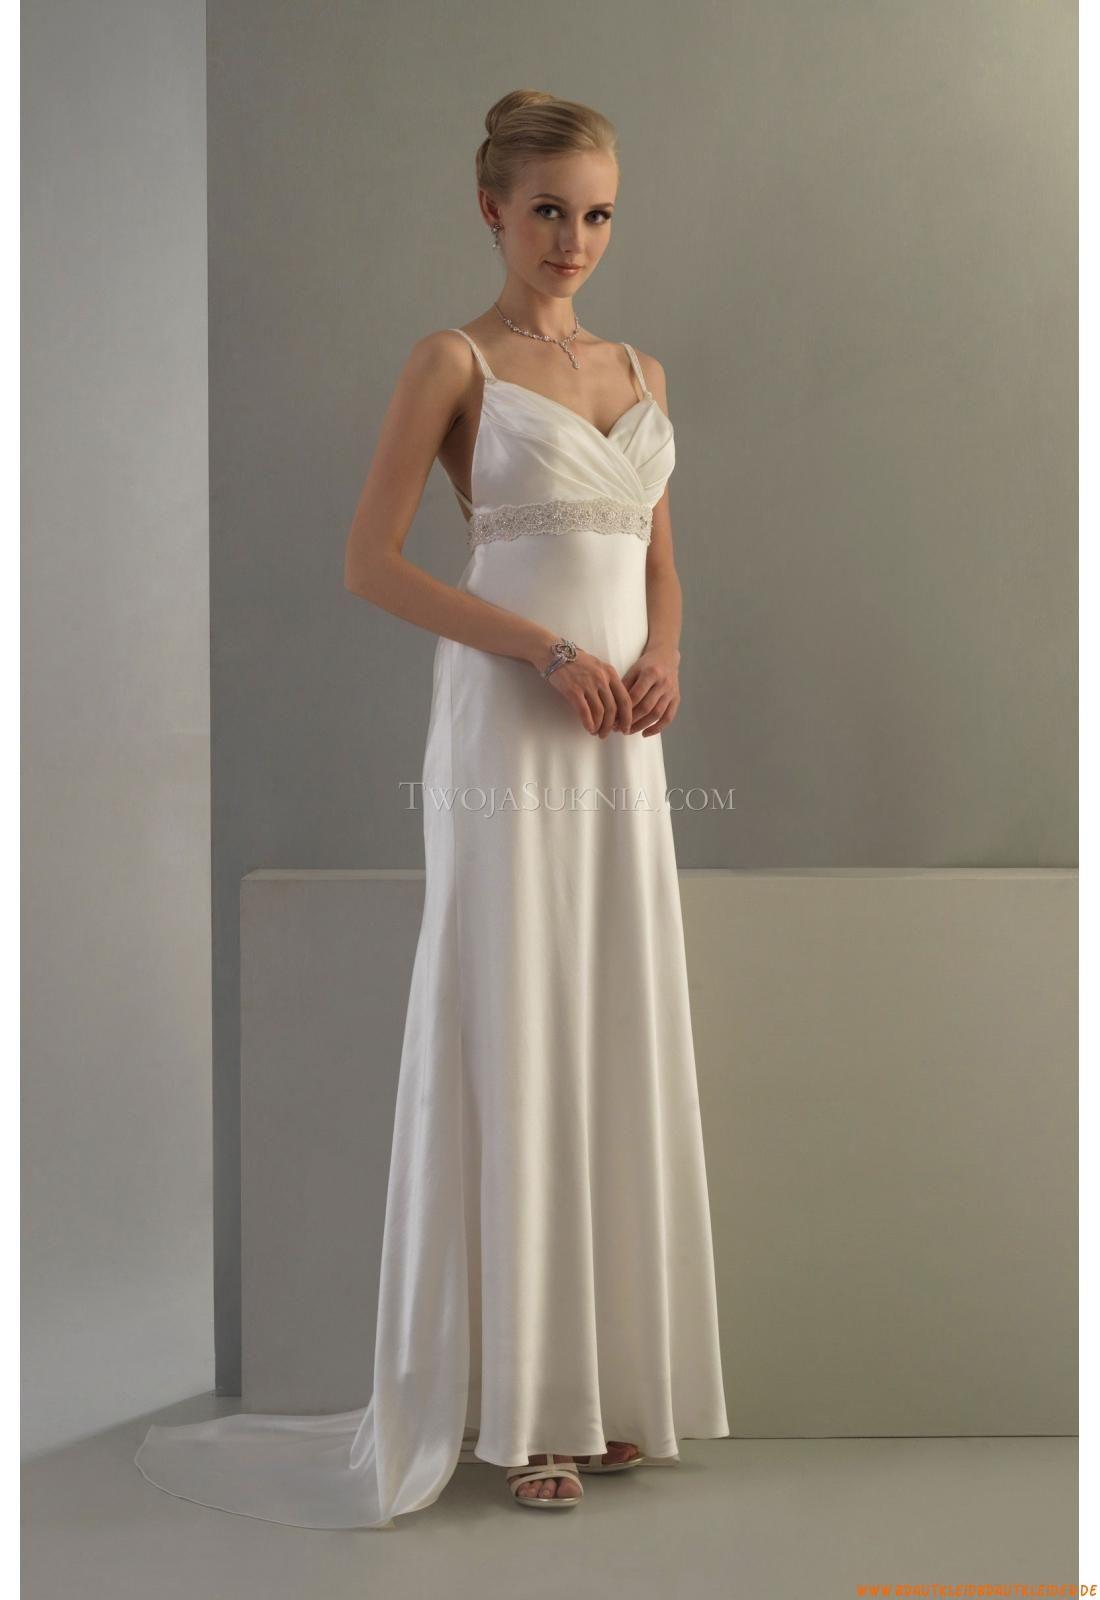 klumne mollig Bodenlang Elegante Günstige Brautkleider | Mollige ...